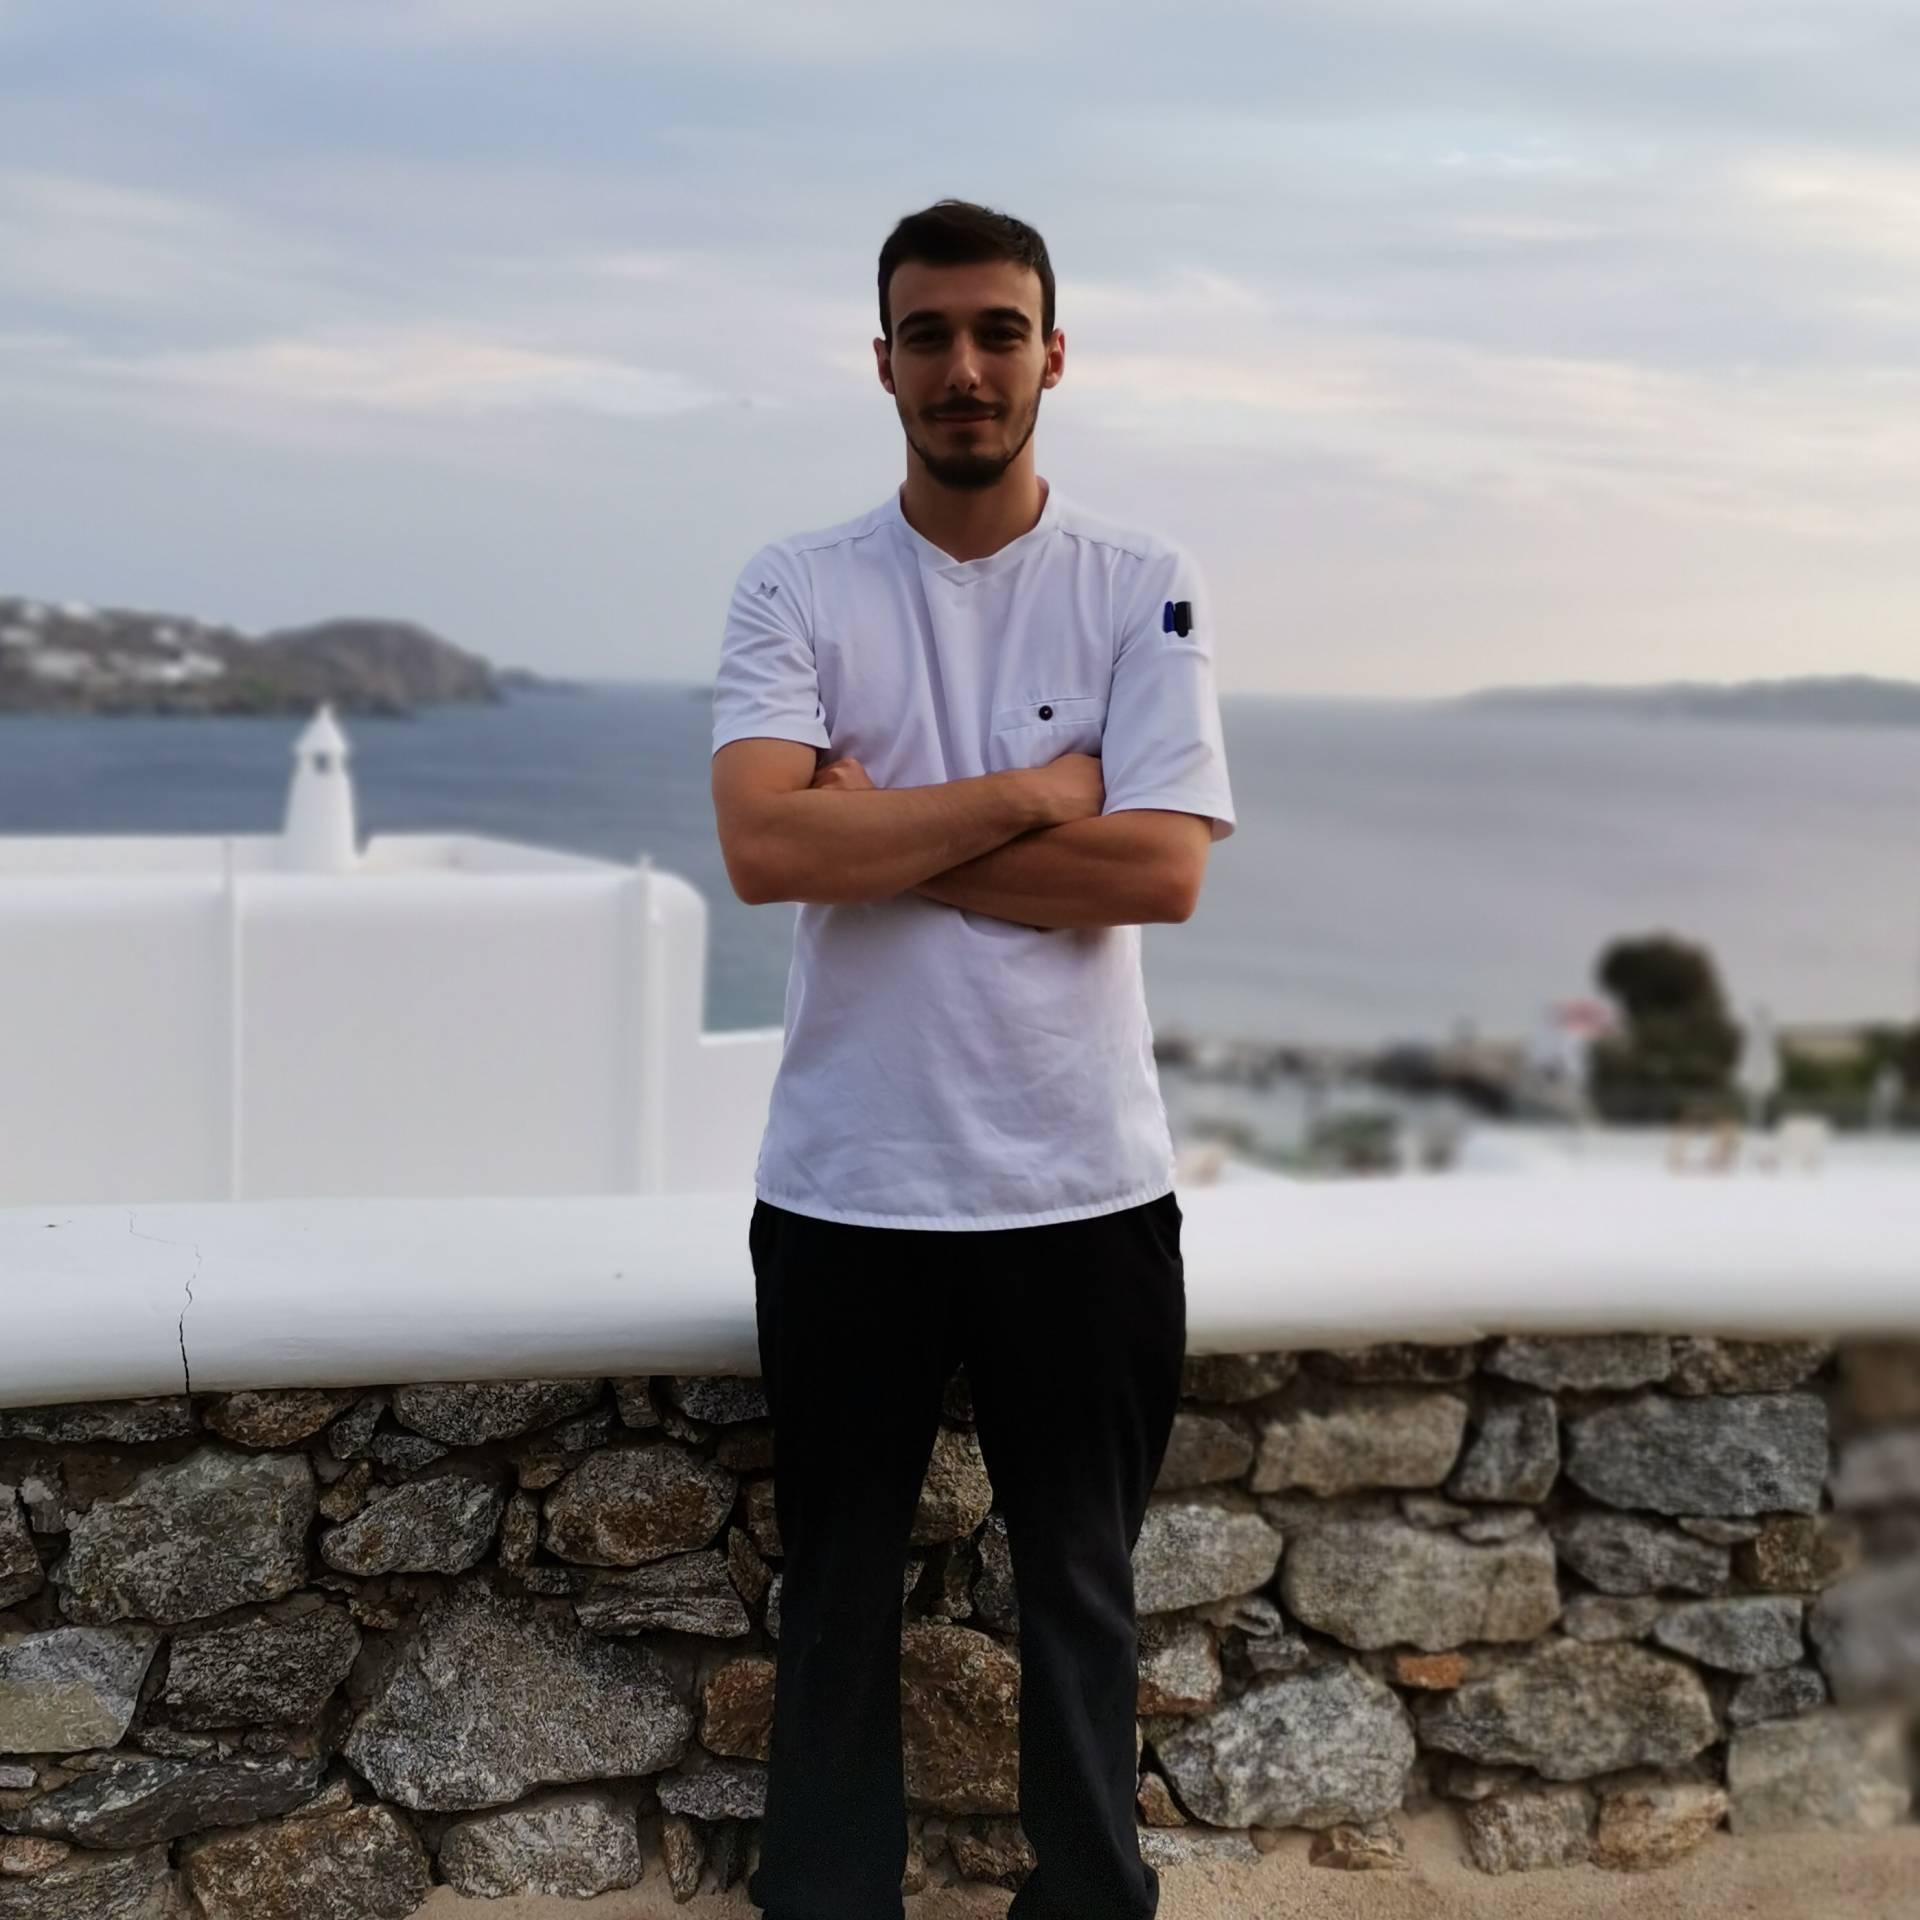 Photo from Aggelos Sakaj